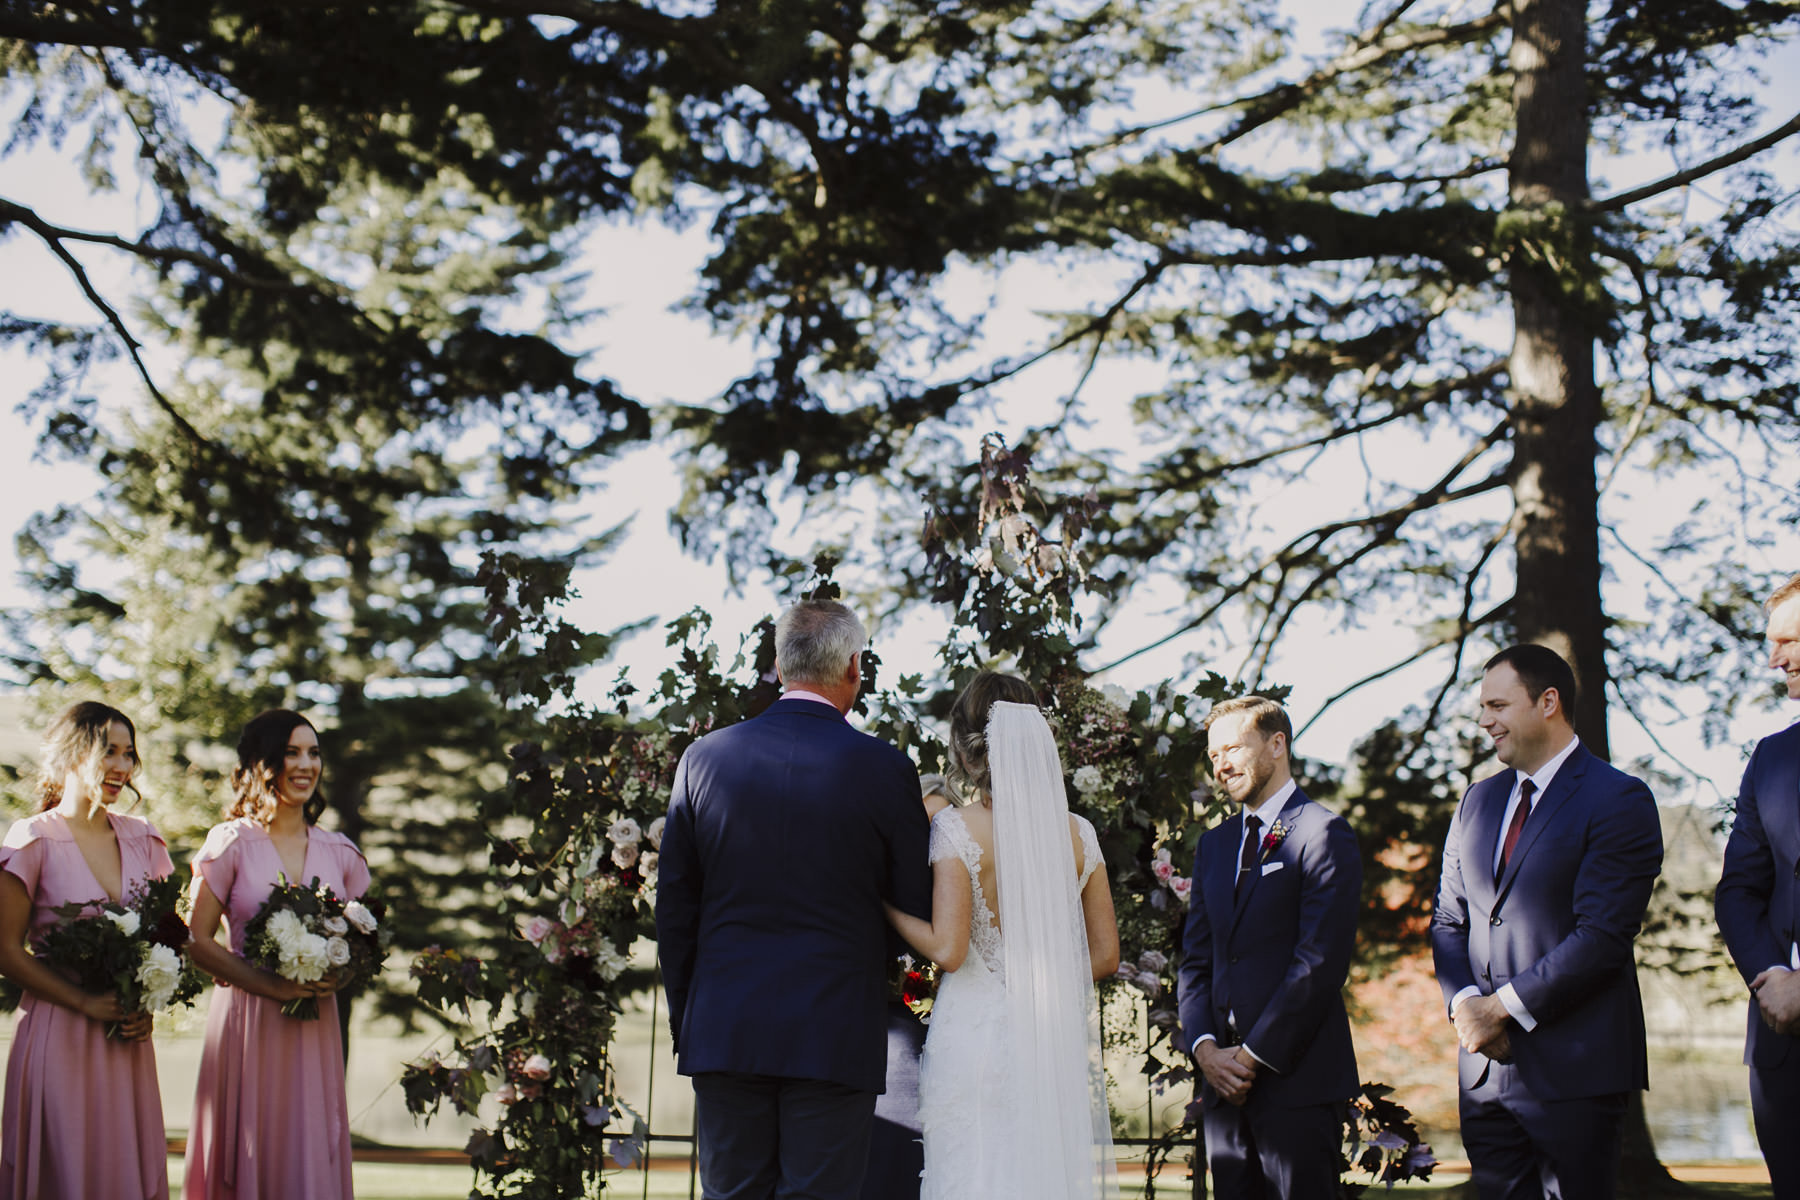 160506_justinaaron_wedding_holly_daniel_pr-90.jpg